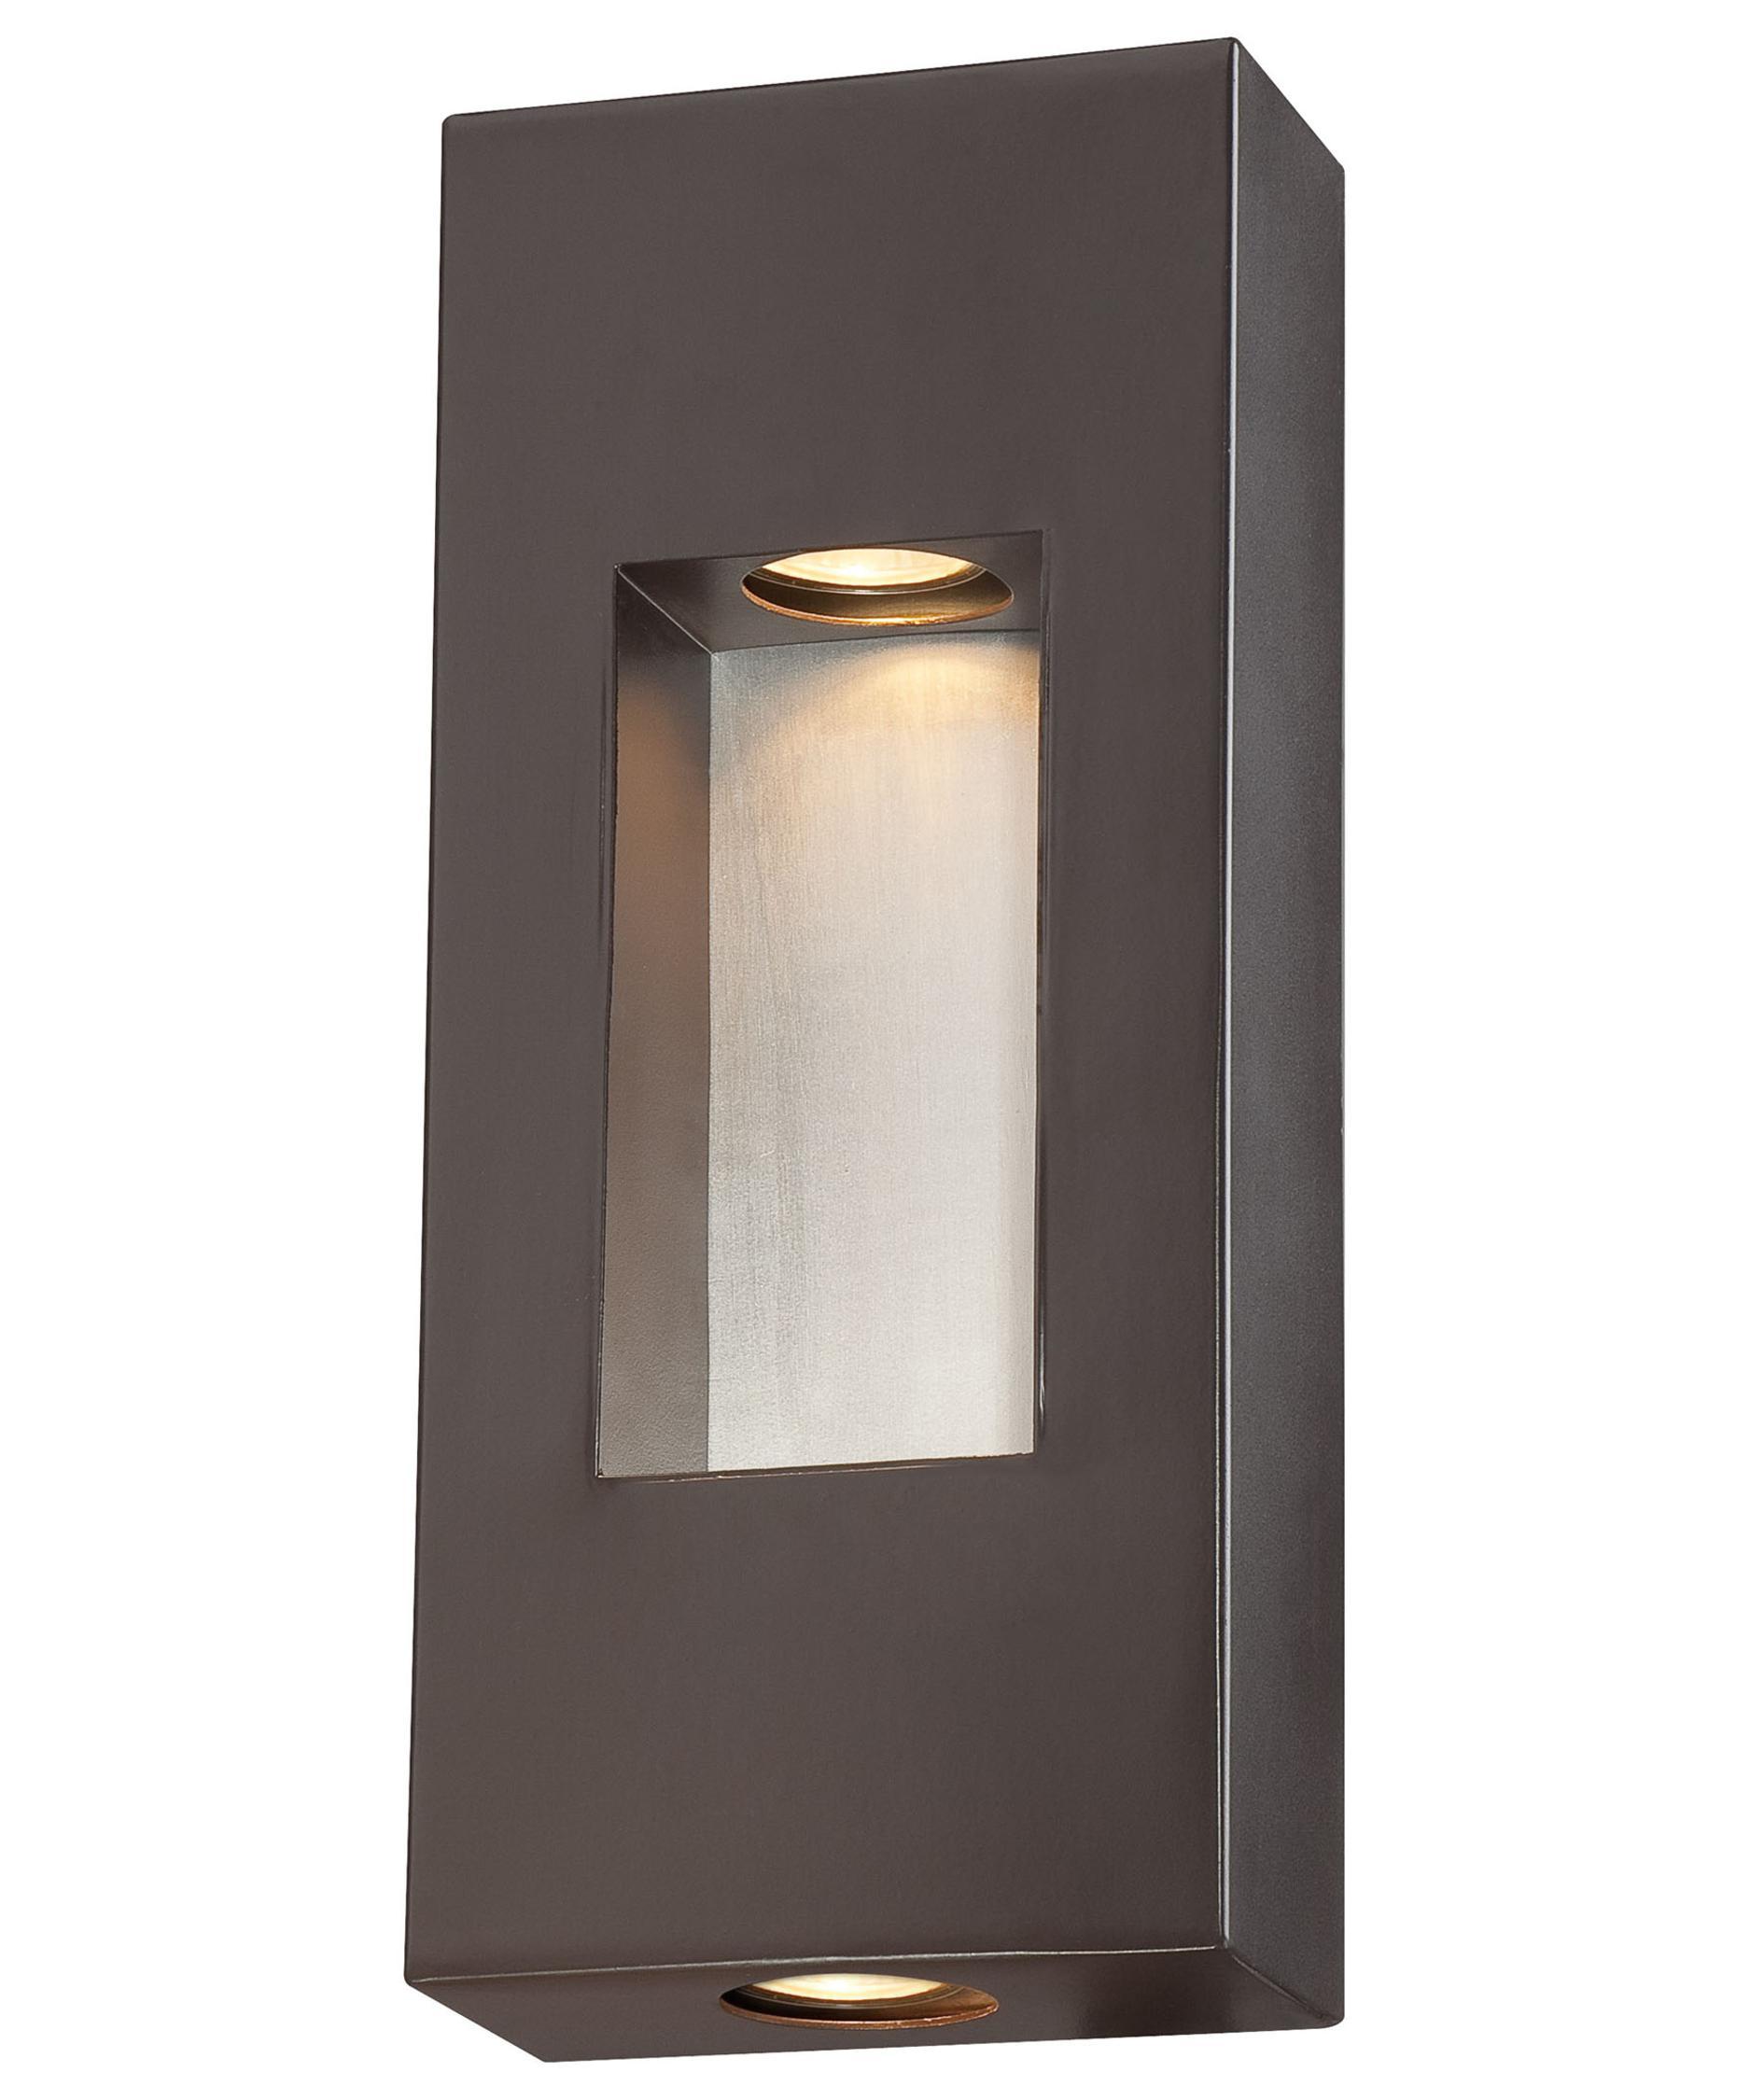 Minka Lavery 72371 Geox 6 Inch Wide 2 Light Outdoor Wall Light | Capitol  Lighting 1 800lighting.com